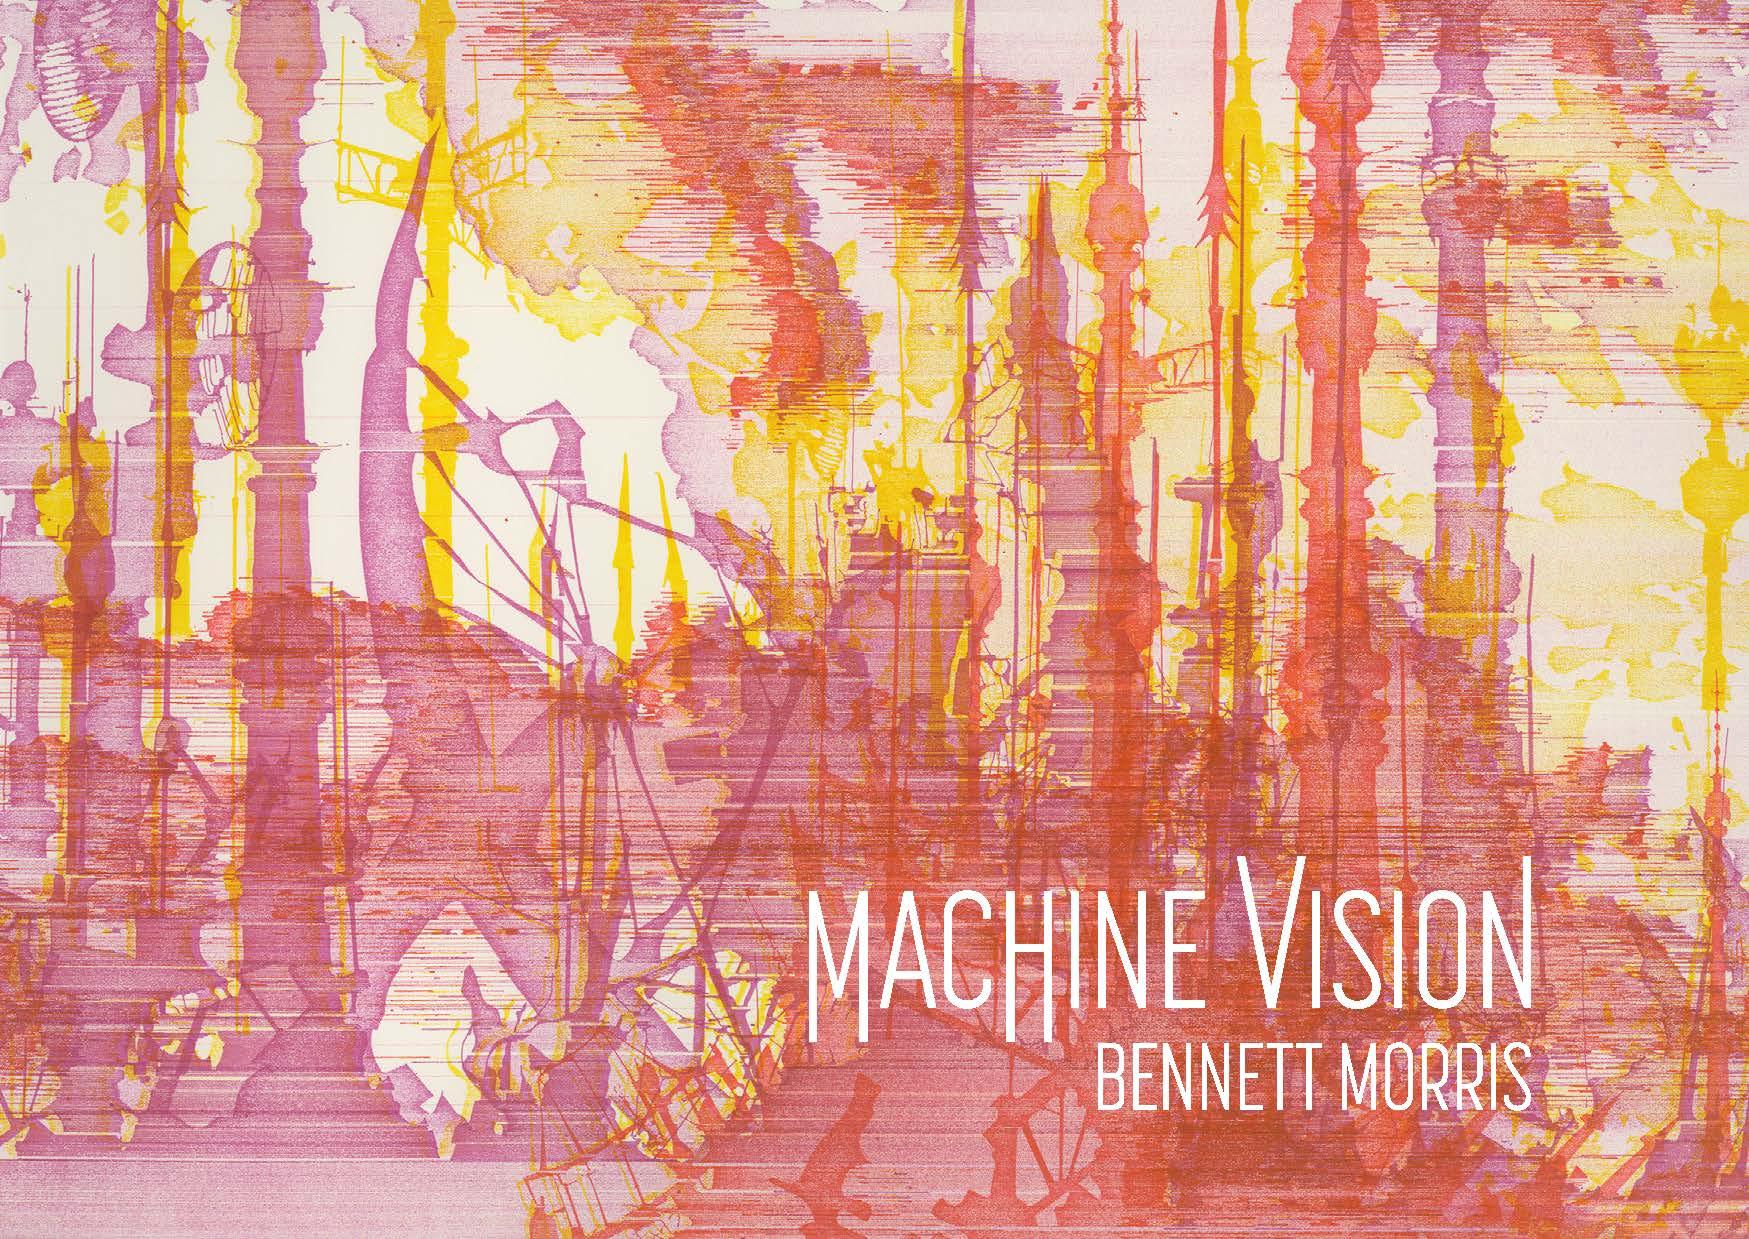 Bennett Morris | Machine Vision